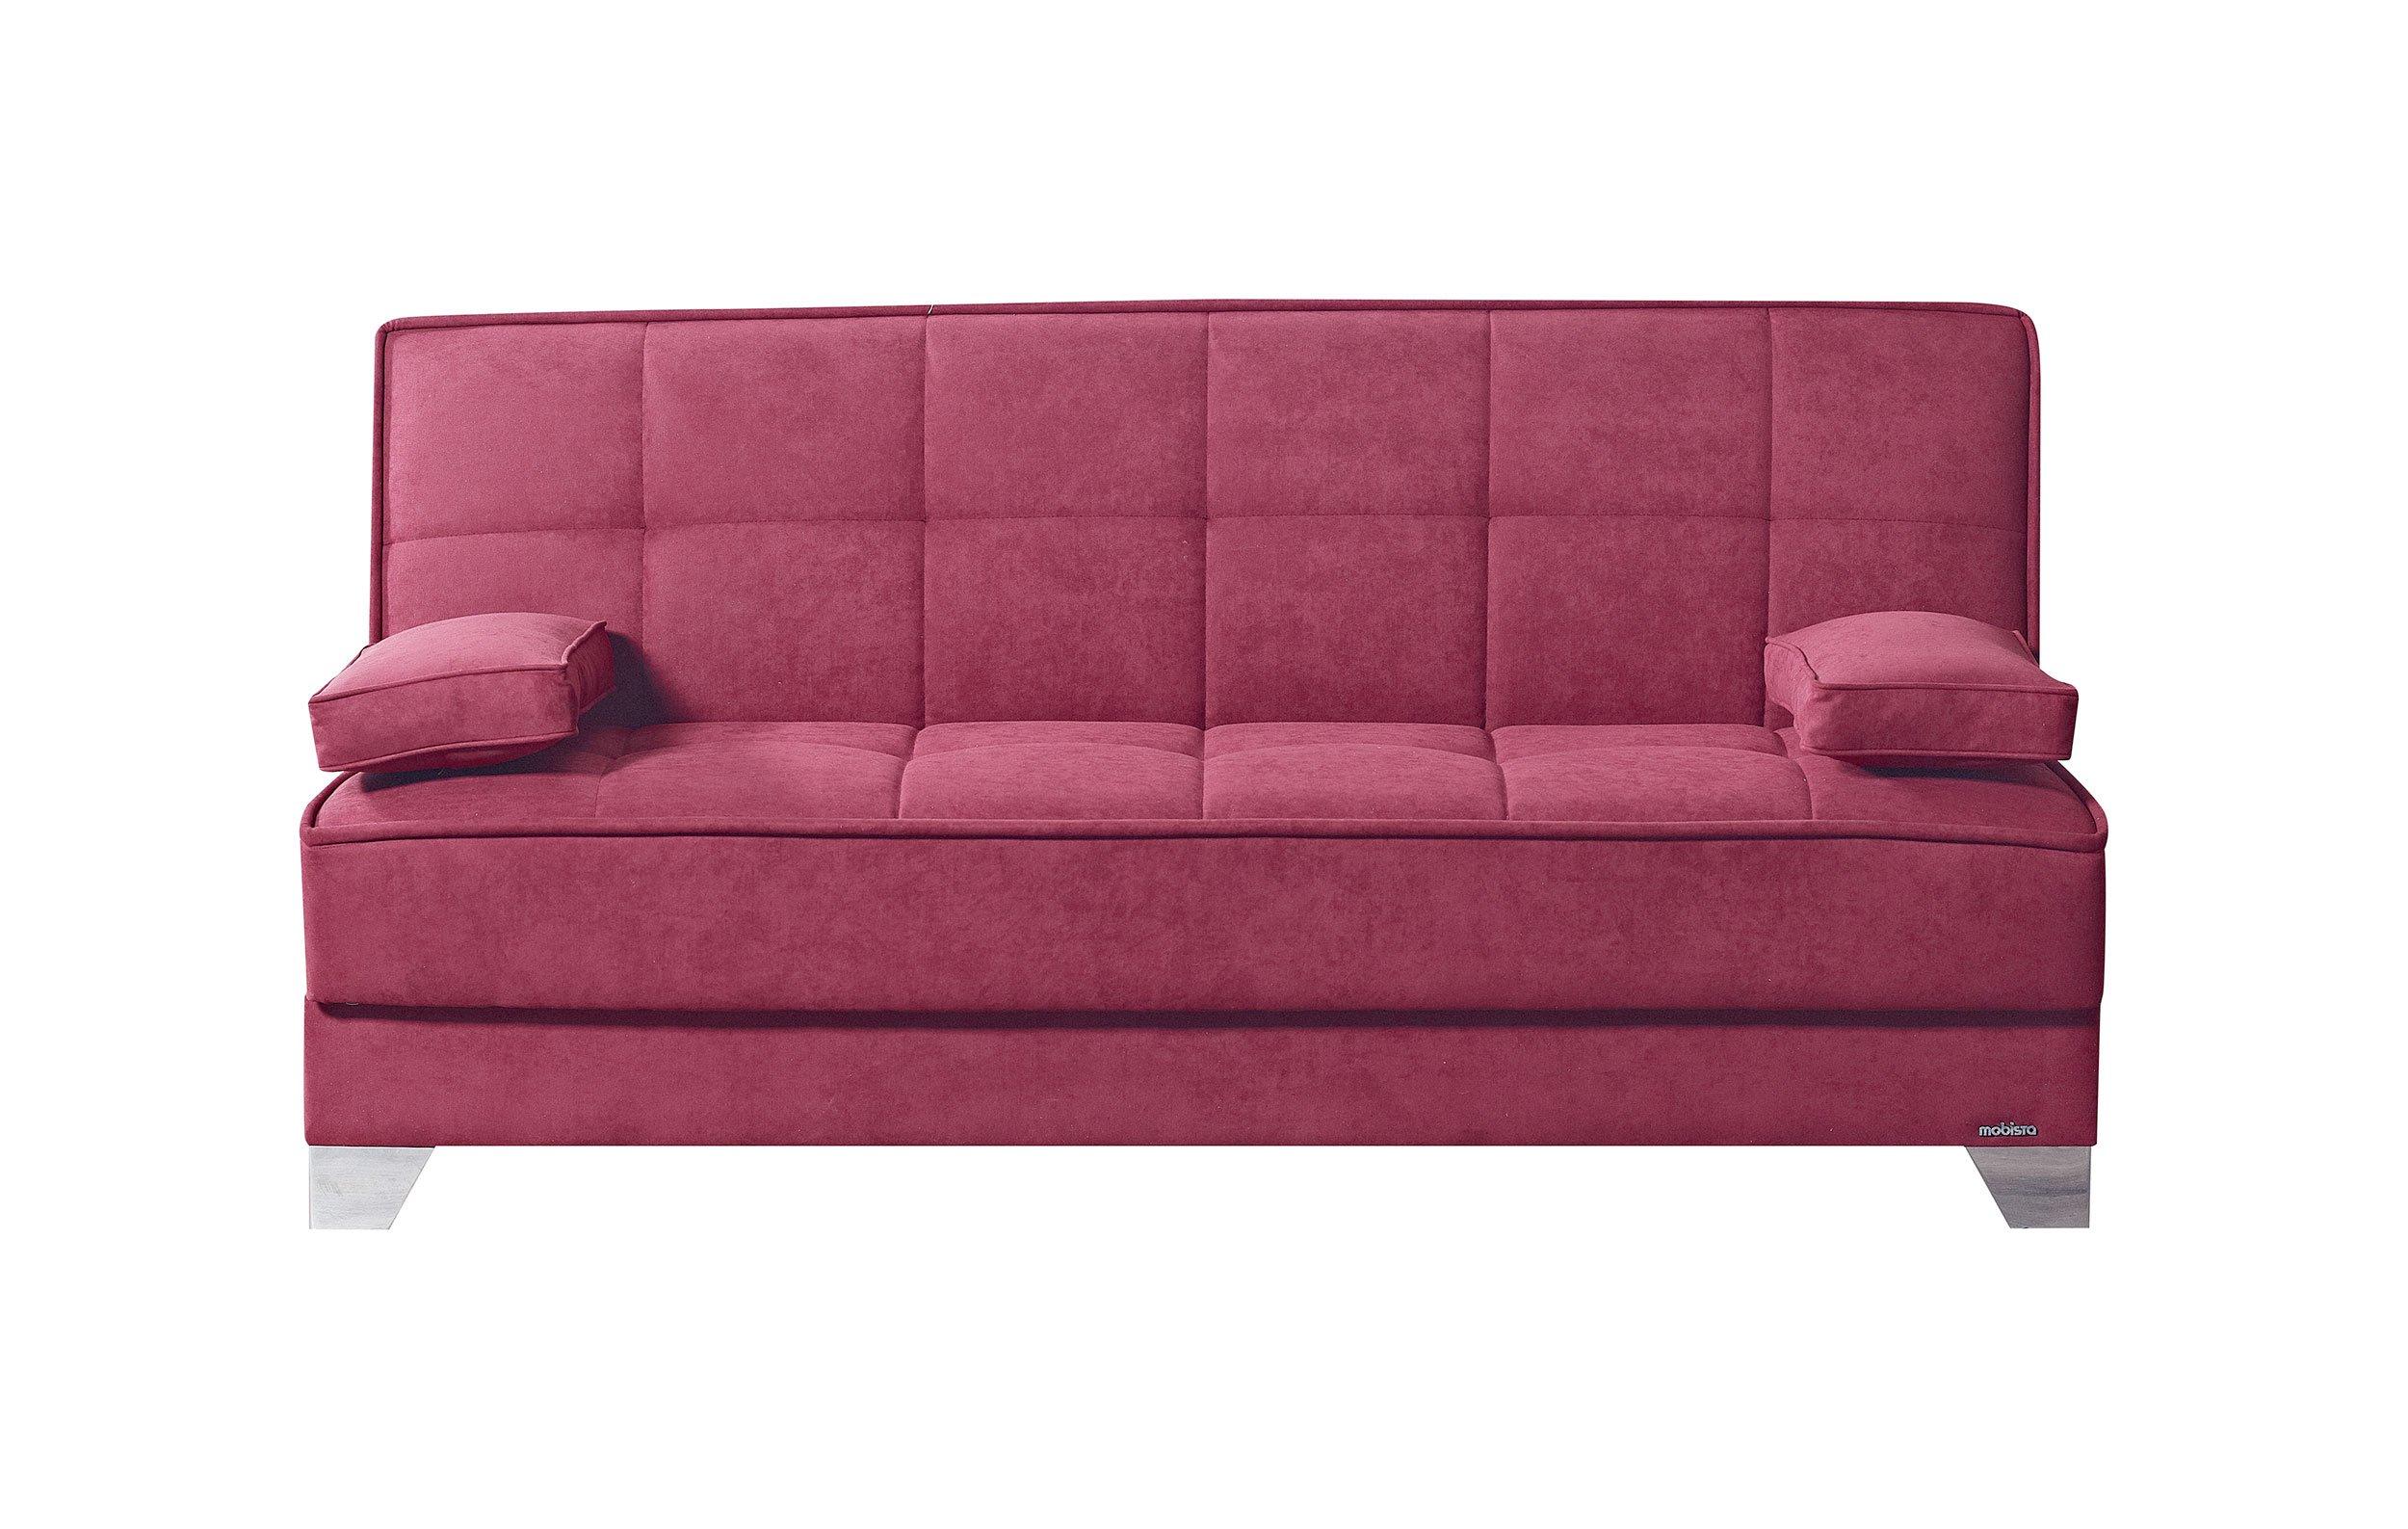 Nexo carisma burgundy sofa bed by mobista for Sofa bed name